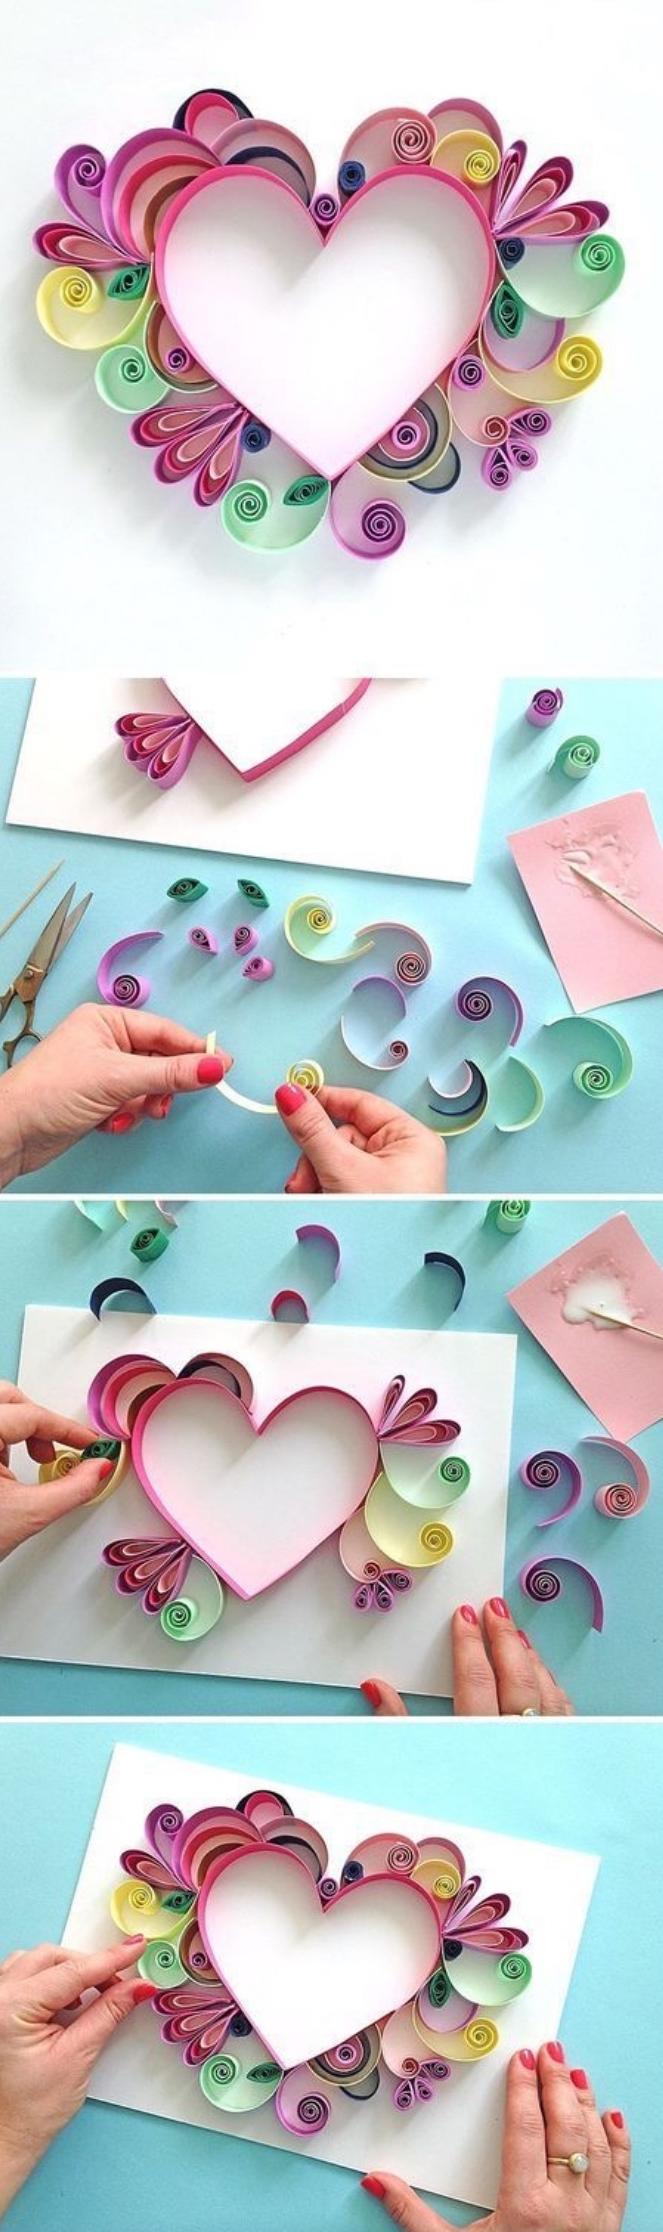 Una ghirlanda di cuoricini di carta colorata come decorazione